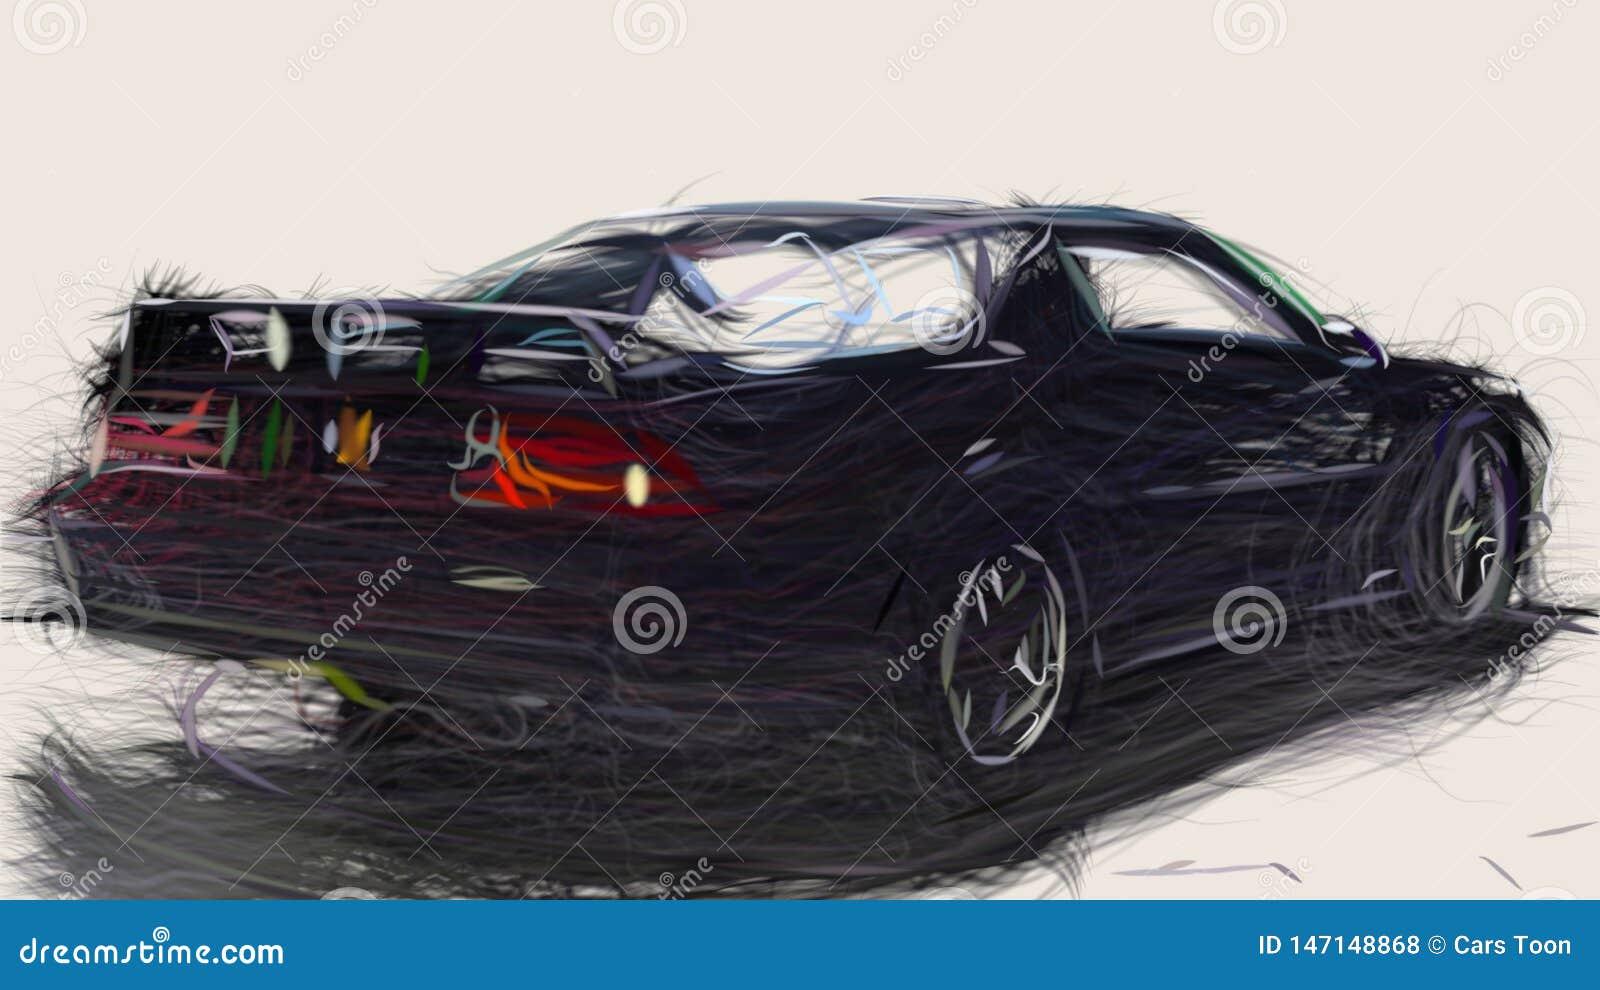 1991 Chevrolet Camaro Z28 Id 2009 Stock Illustration